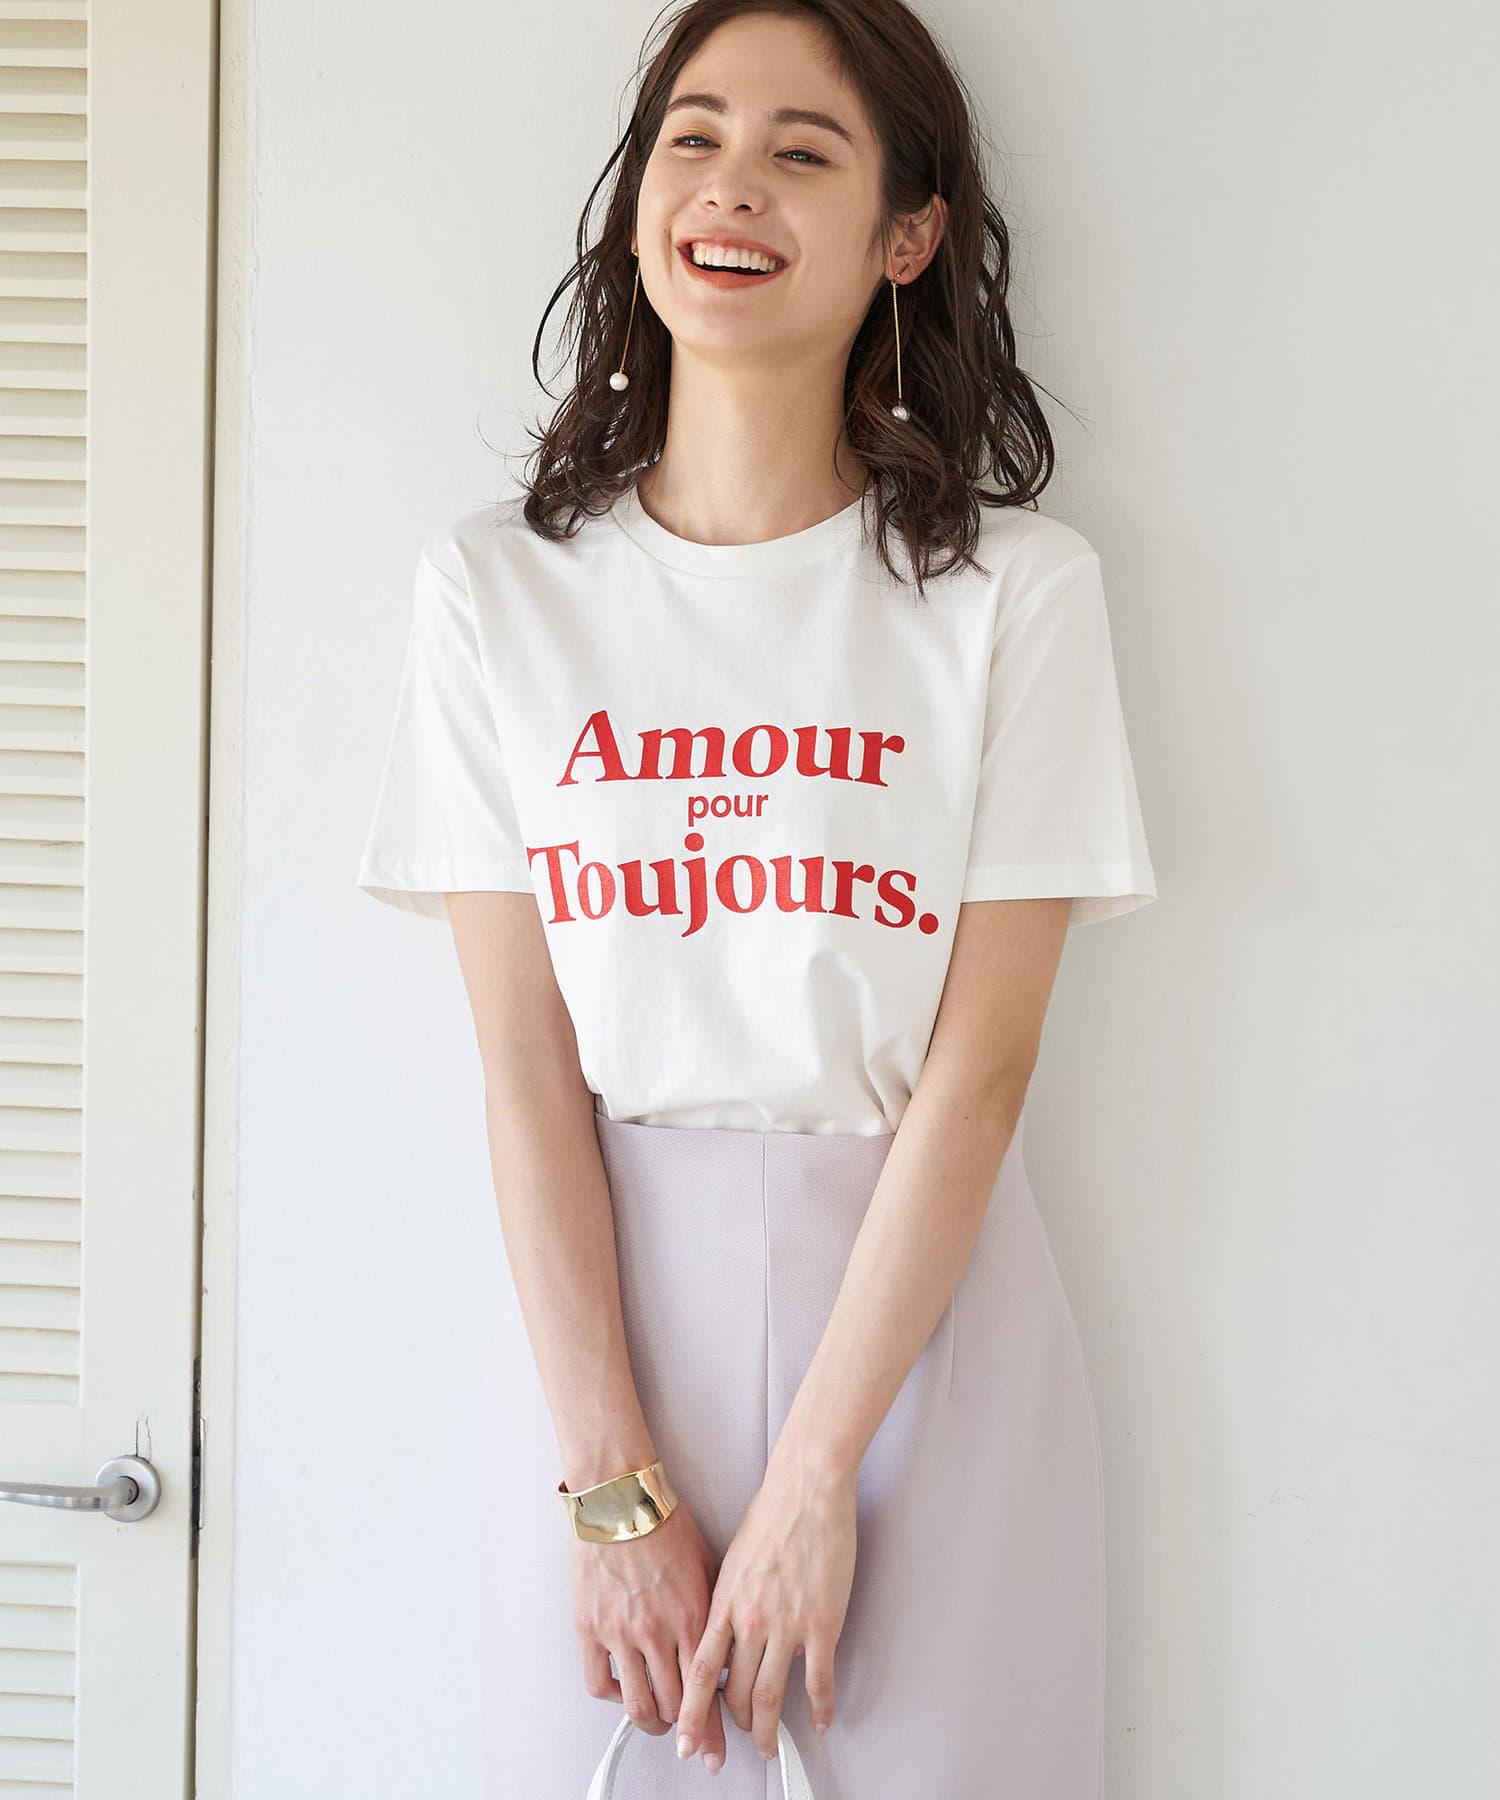 La boutique BonBon(ラブティックボンボン) 【洗える・LES PETITS BASICS】AMOURロゴ Tシャツ